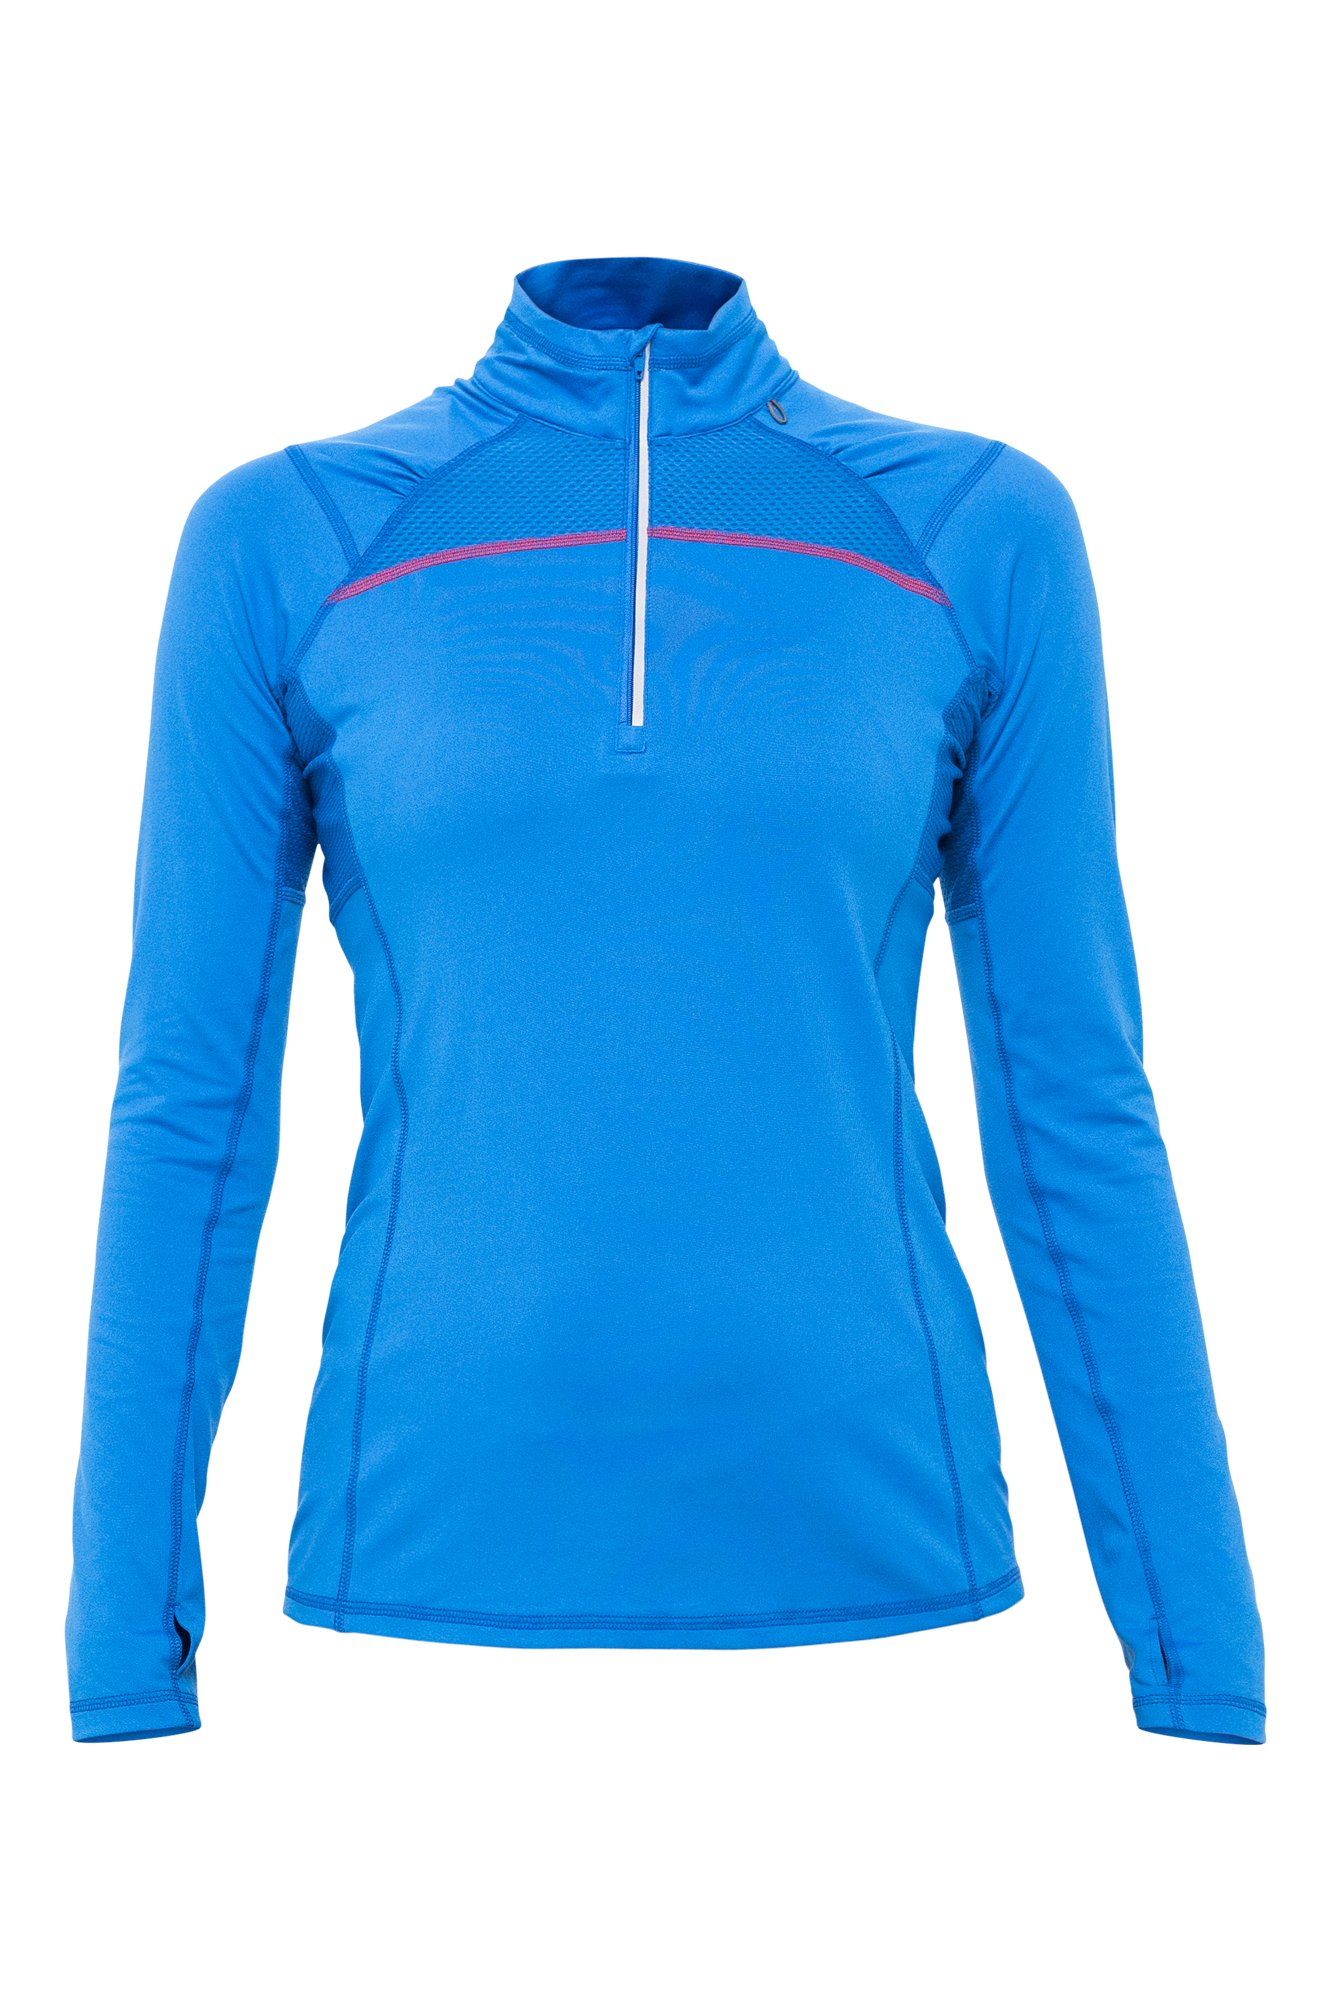 Lija Women's Dawn 1/4 Zip Pullover, Deep Blue/Poppy, X-Large